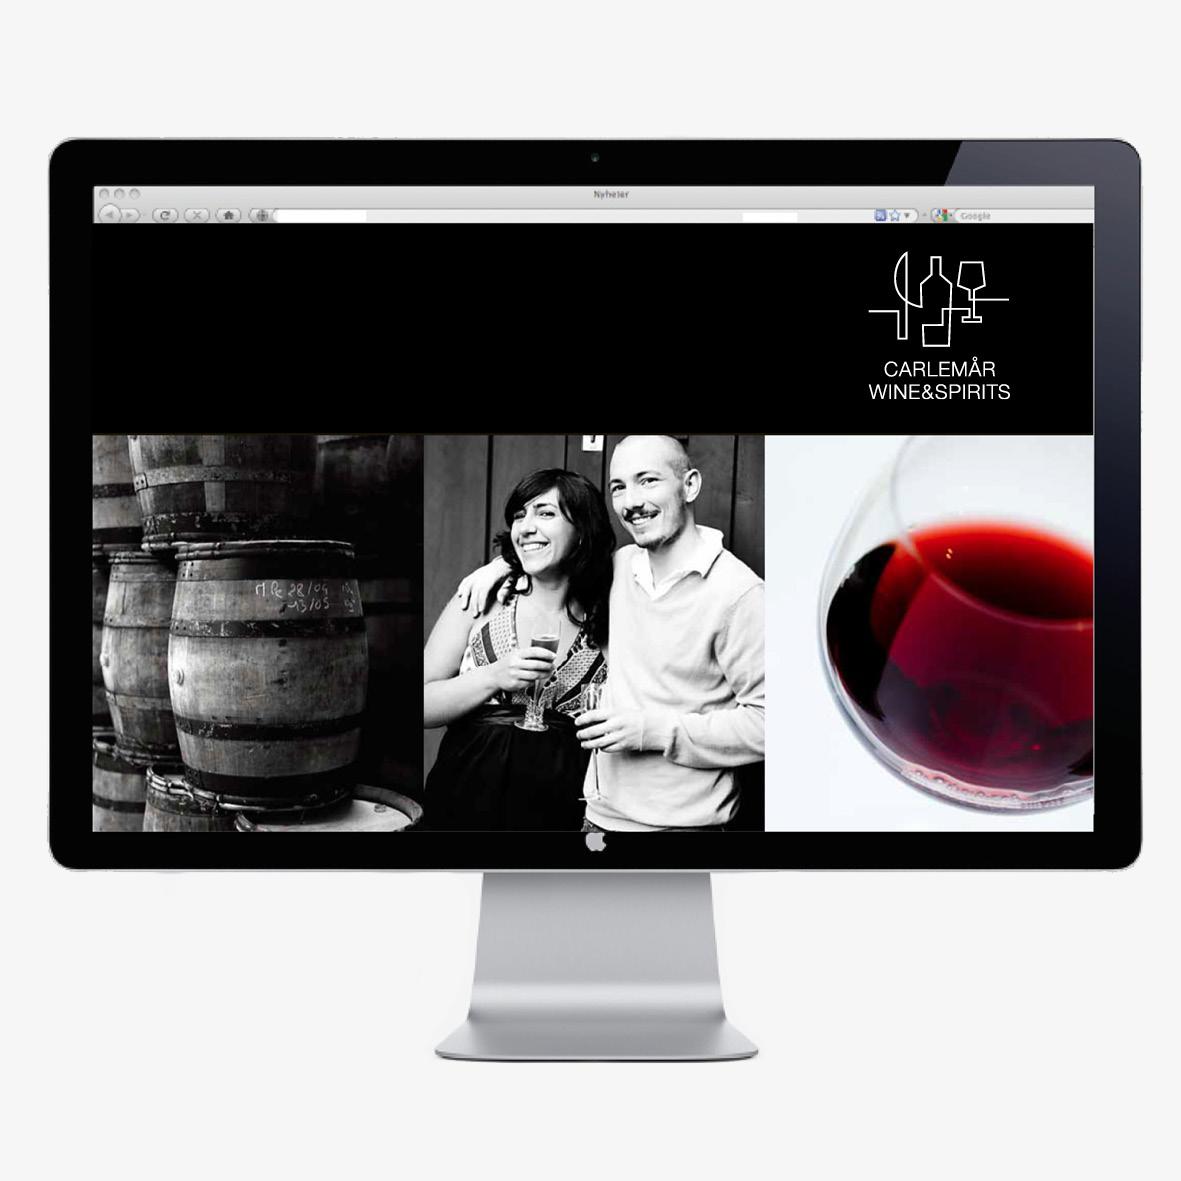 CARLEMÅR WINE & SPIRITS